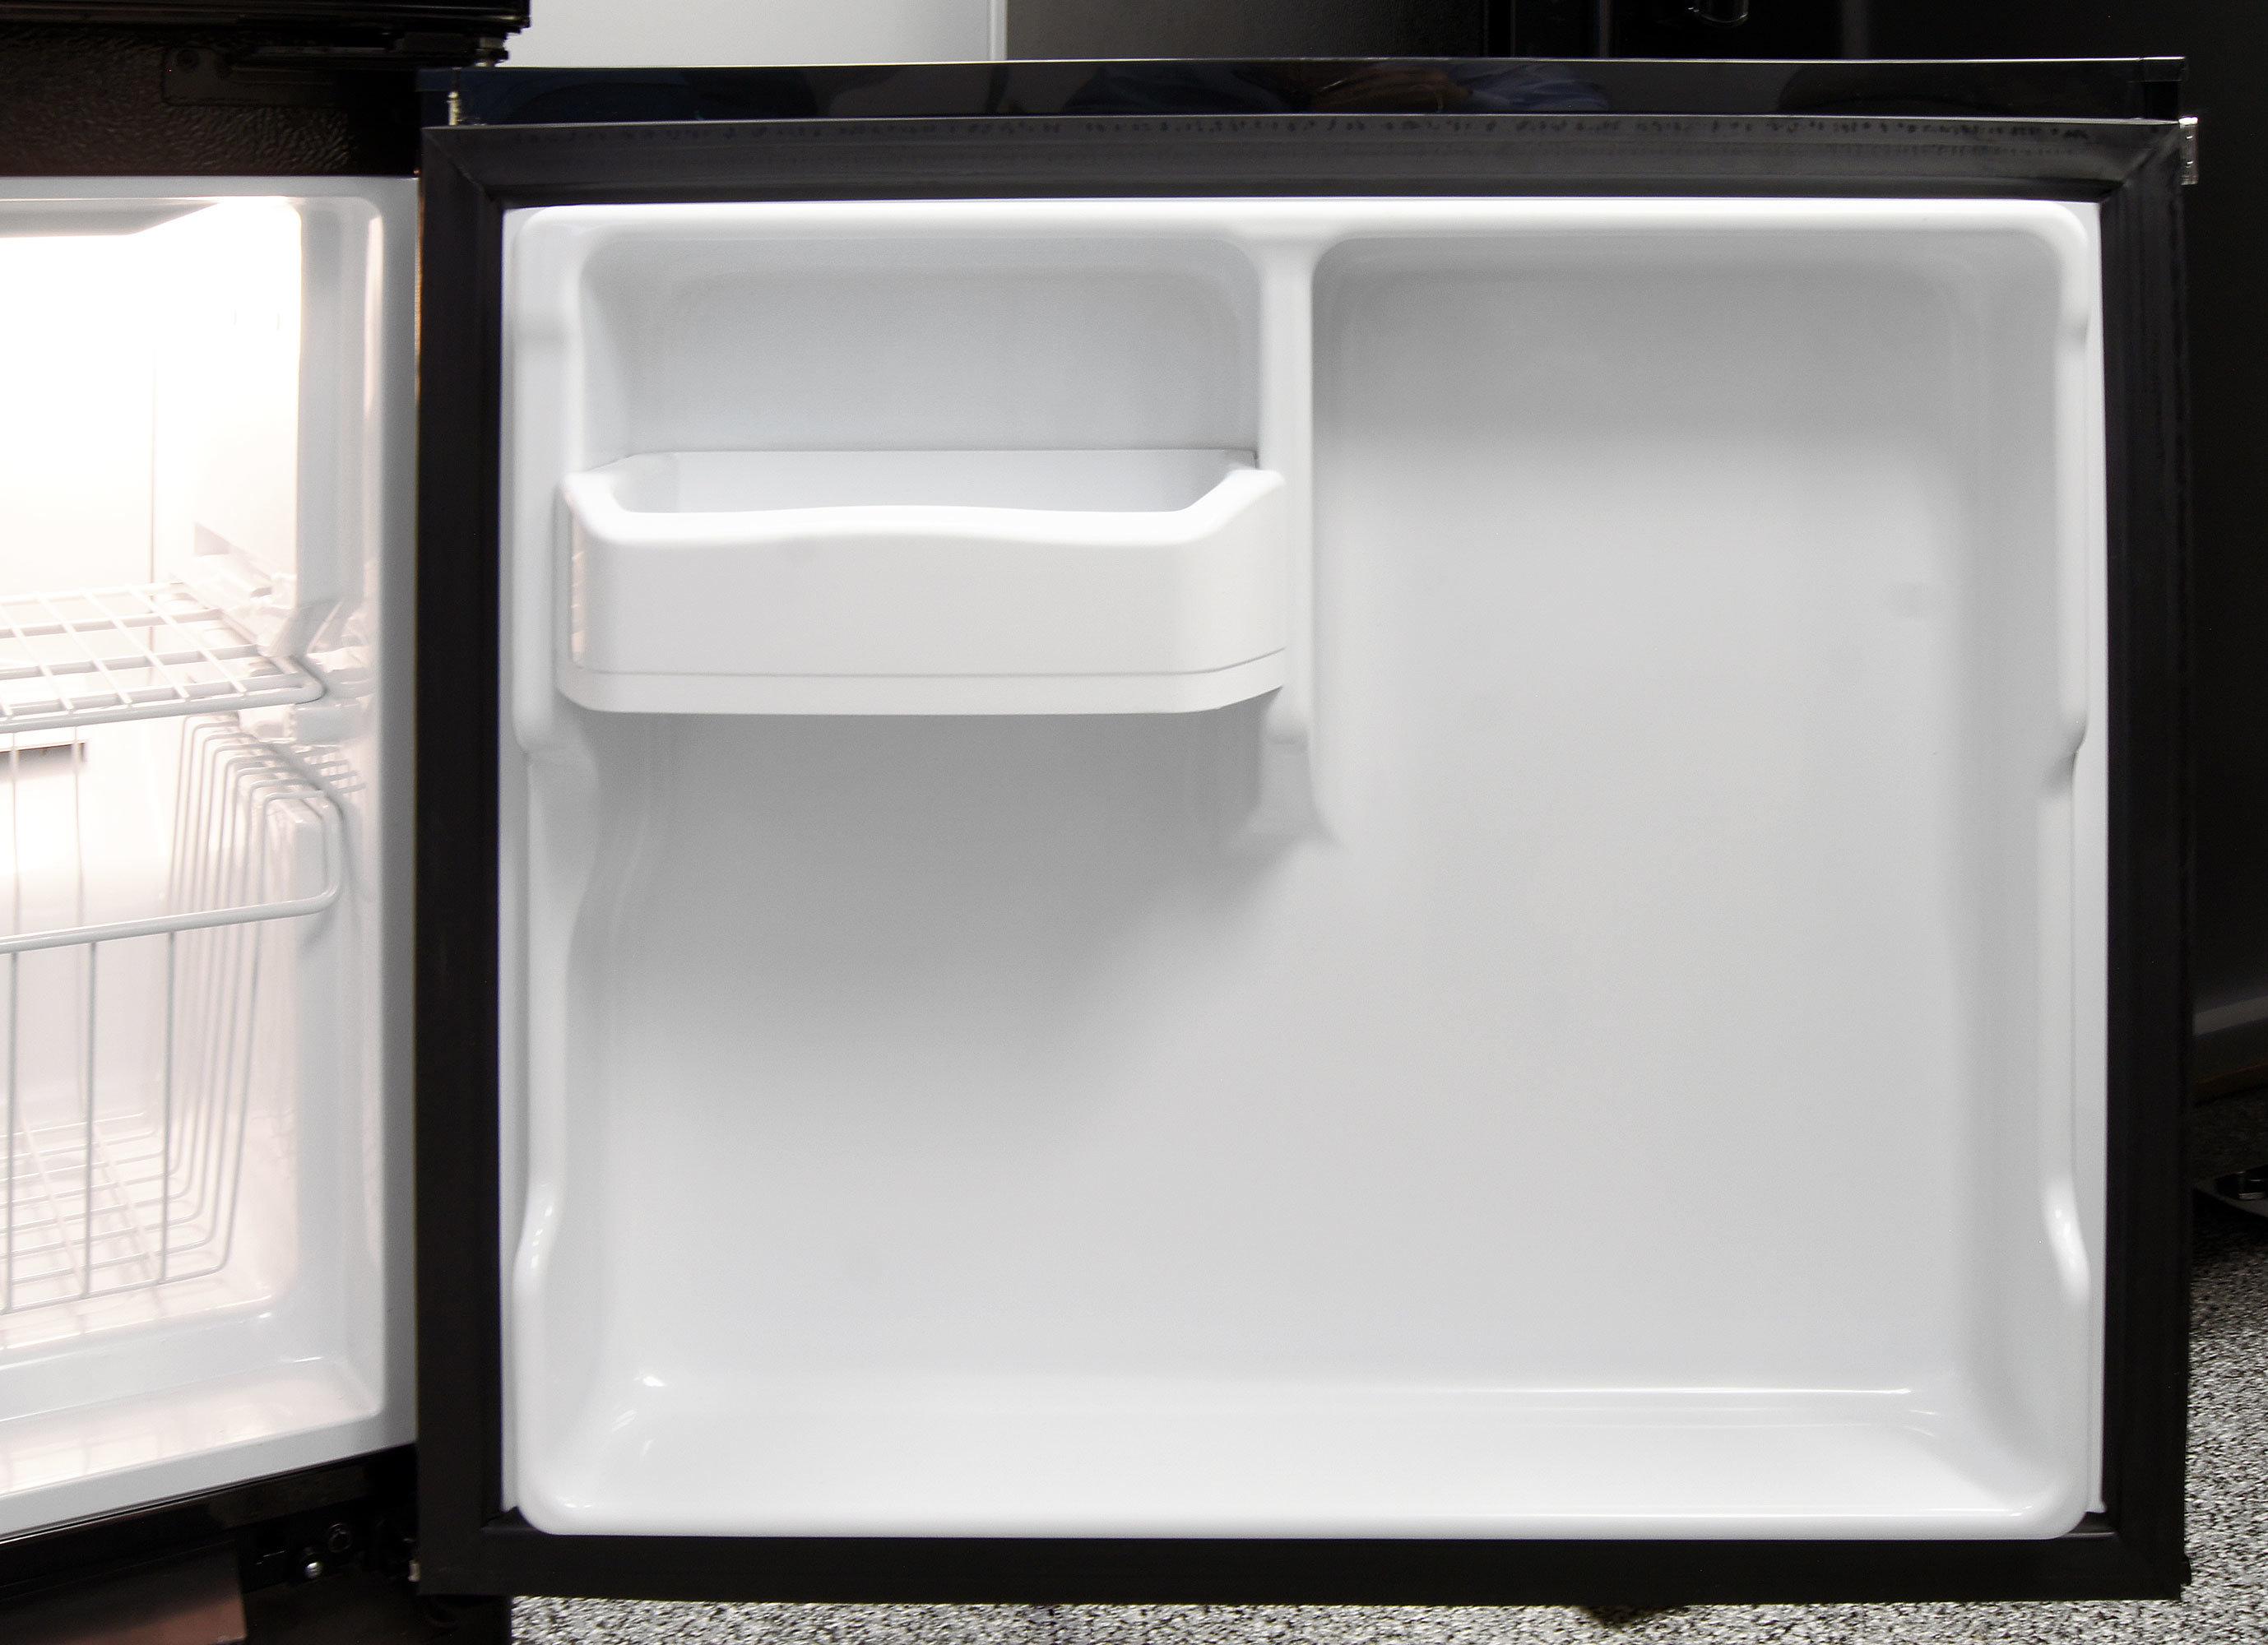 The GE Artistry ABE20EGEBS's freezer door gets just one lonely bucket shelf for supplemental storage.